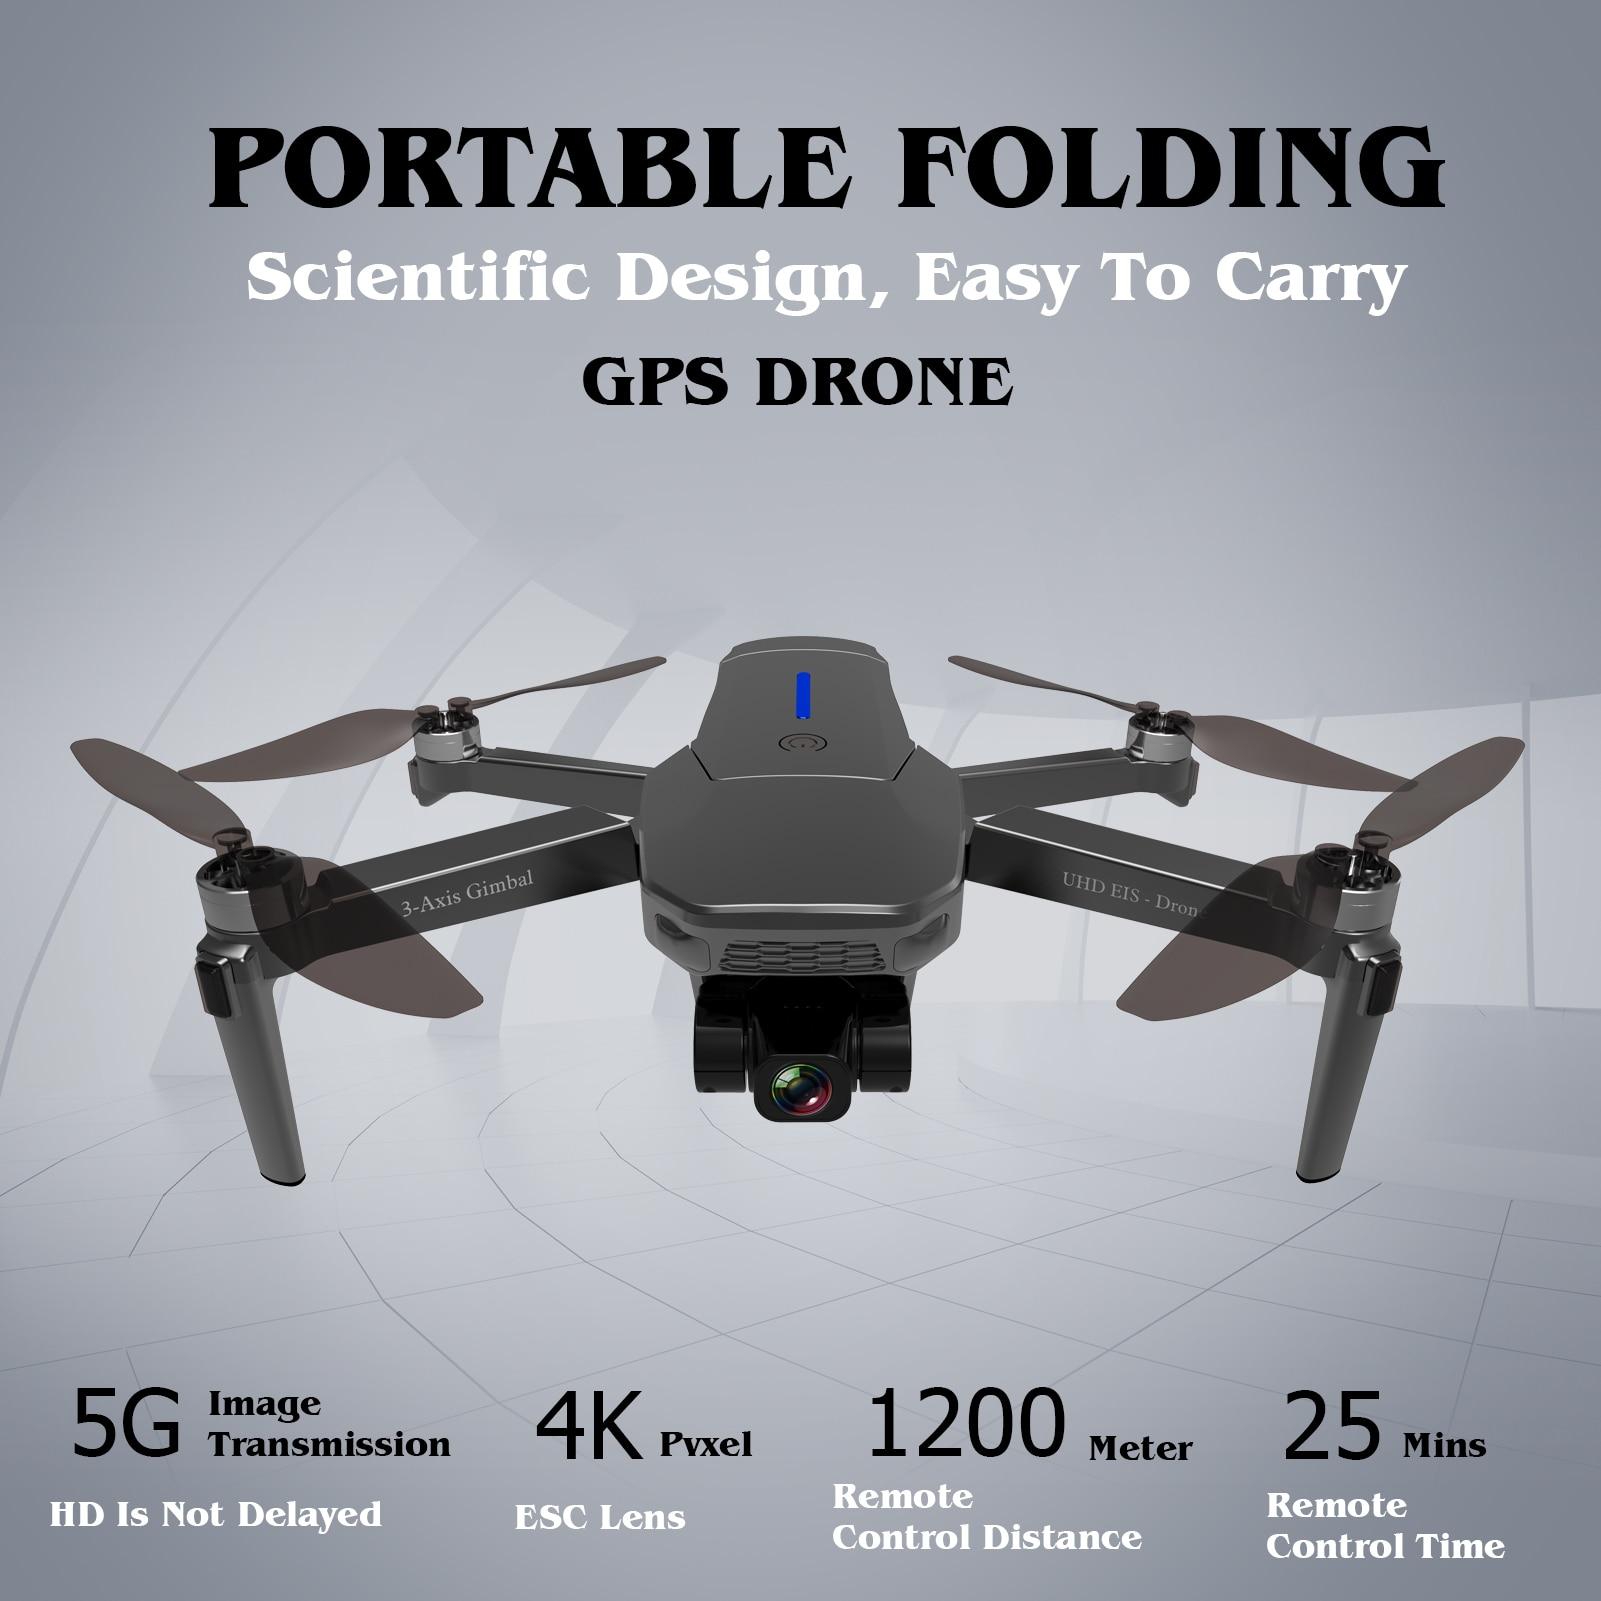 2021 SJY-009MAX Brushless GPS 5G WIFI 4K HD Mechanical 3-Axis Gimbal Camera Rc Drone 25mins flight Control Range 1200 meters enlarge